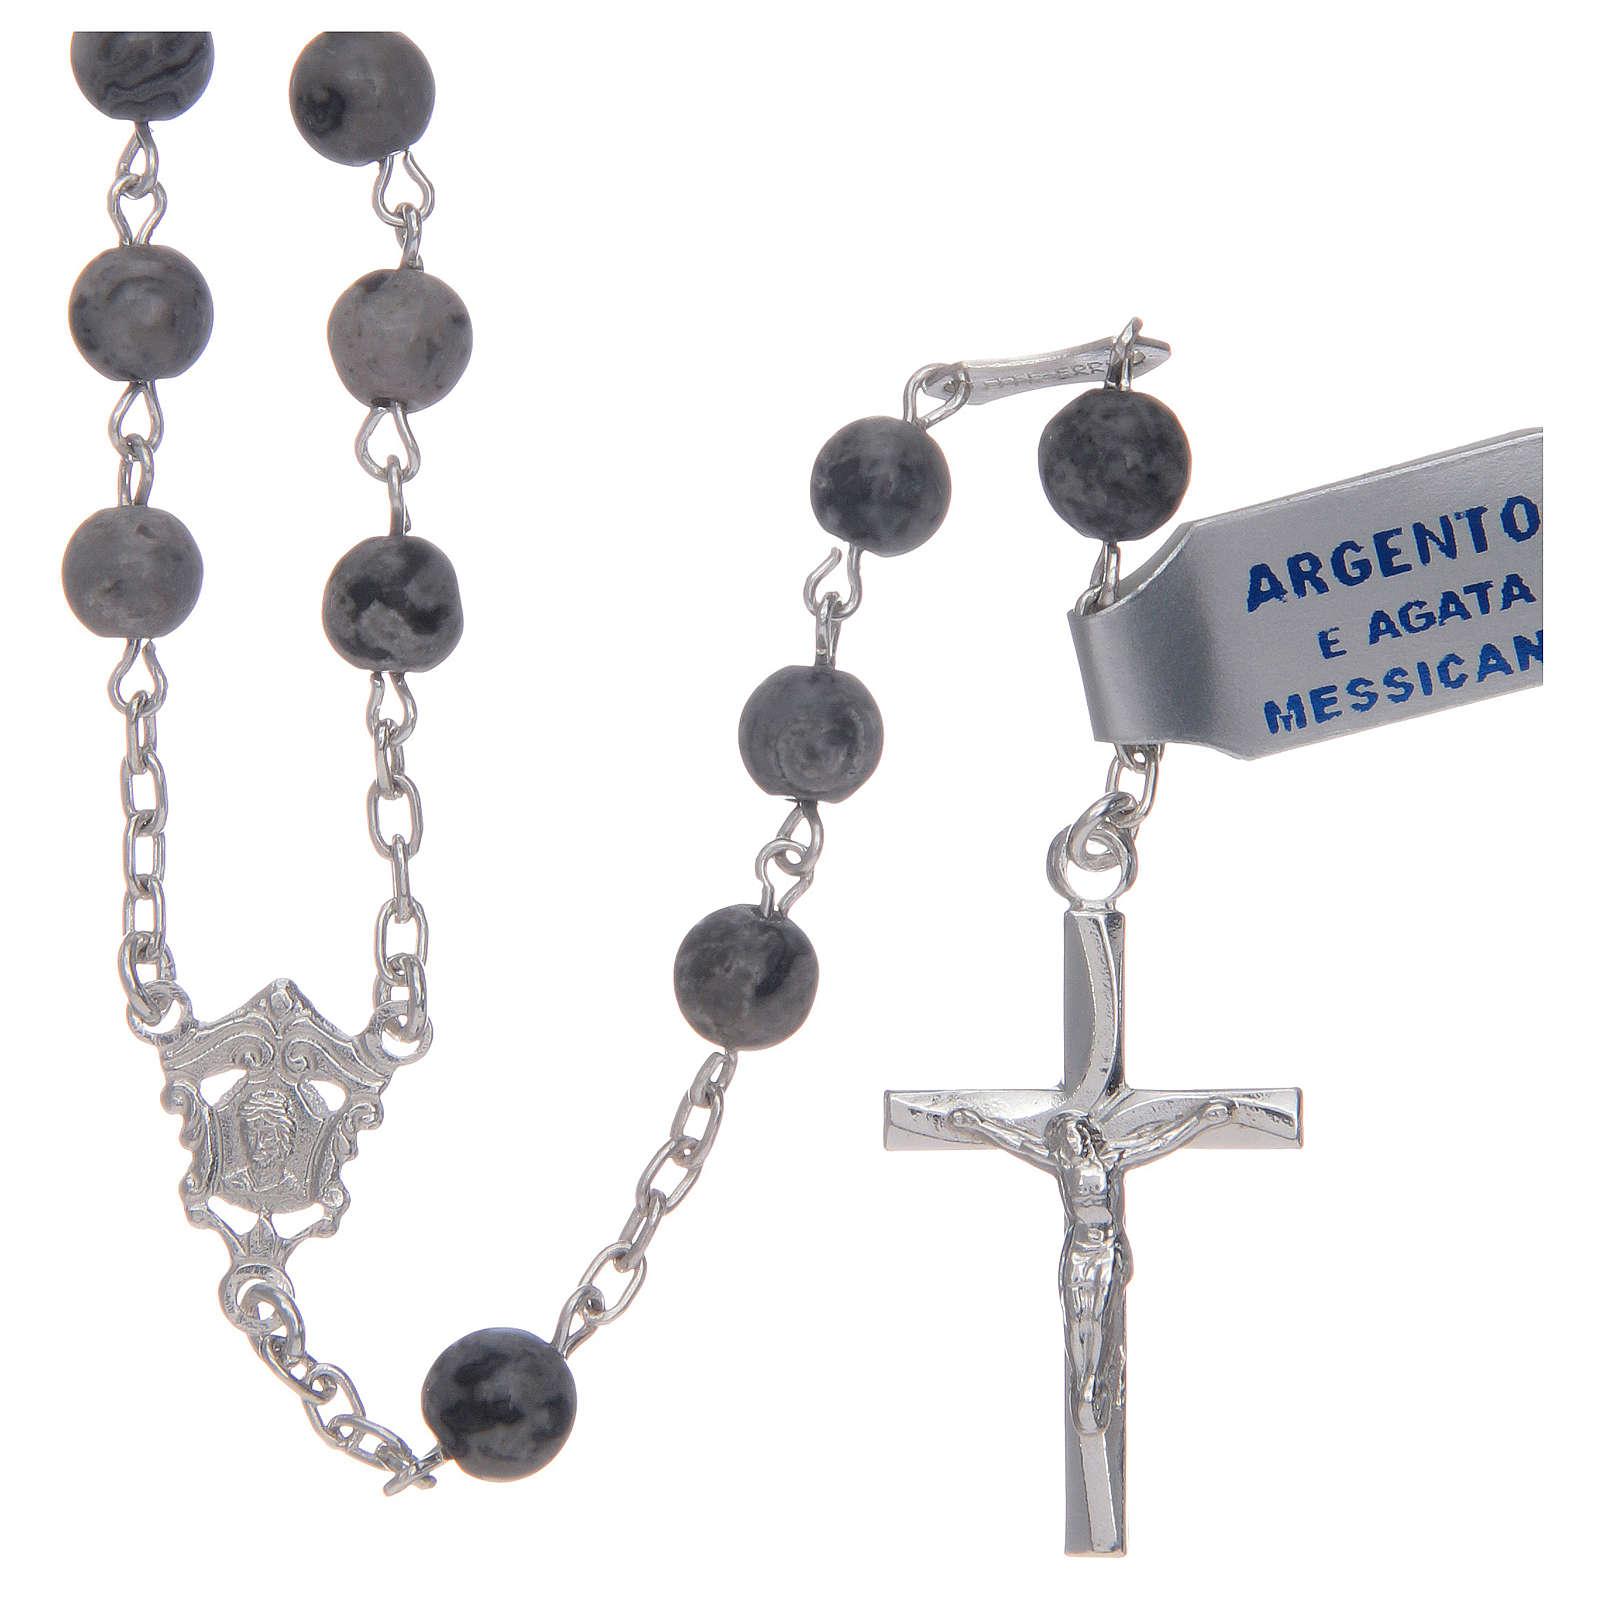 Rosario in agata messicana in argento 800 4